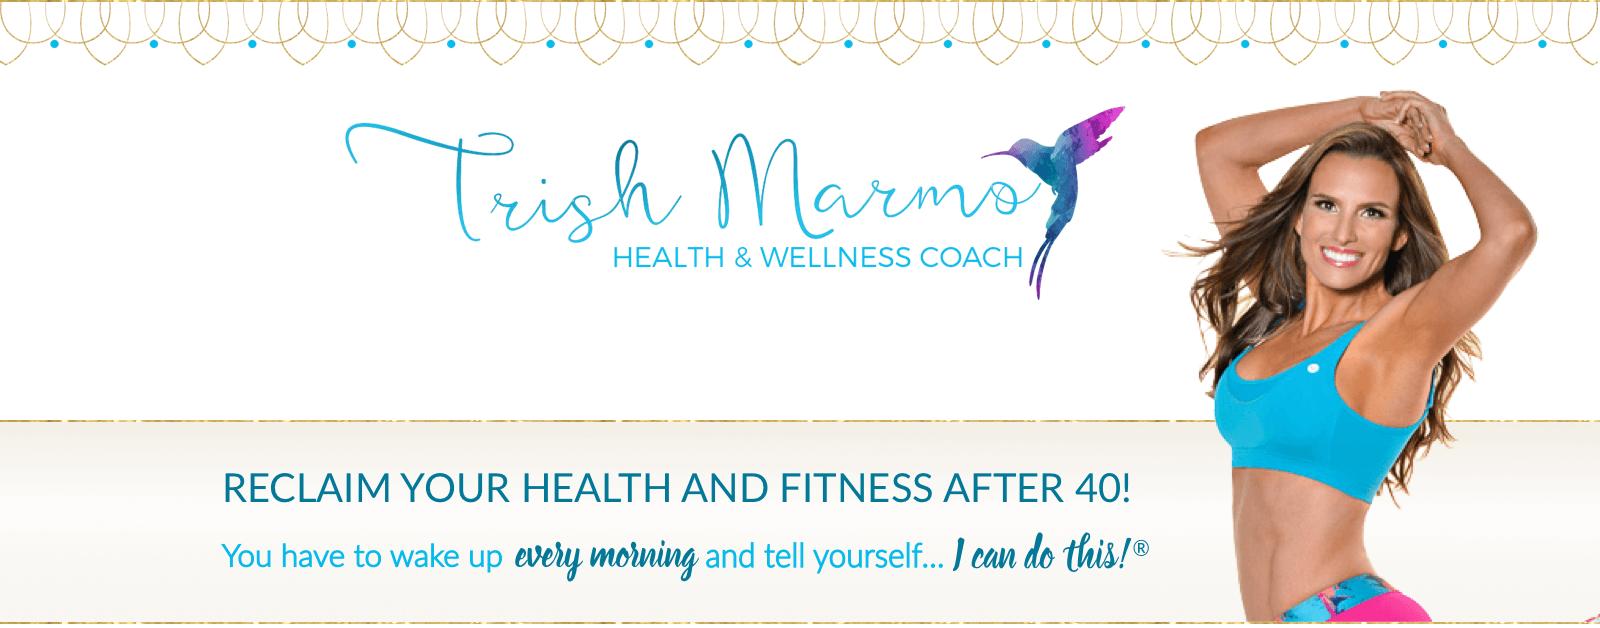 Trish Marmo's Blog